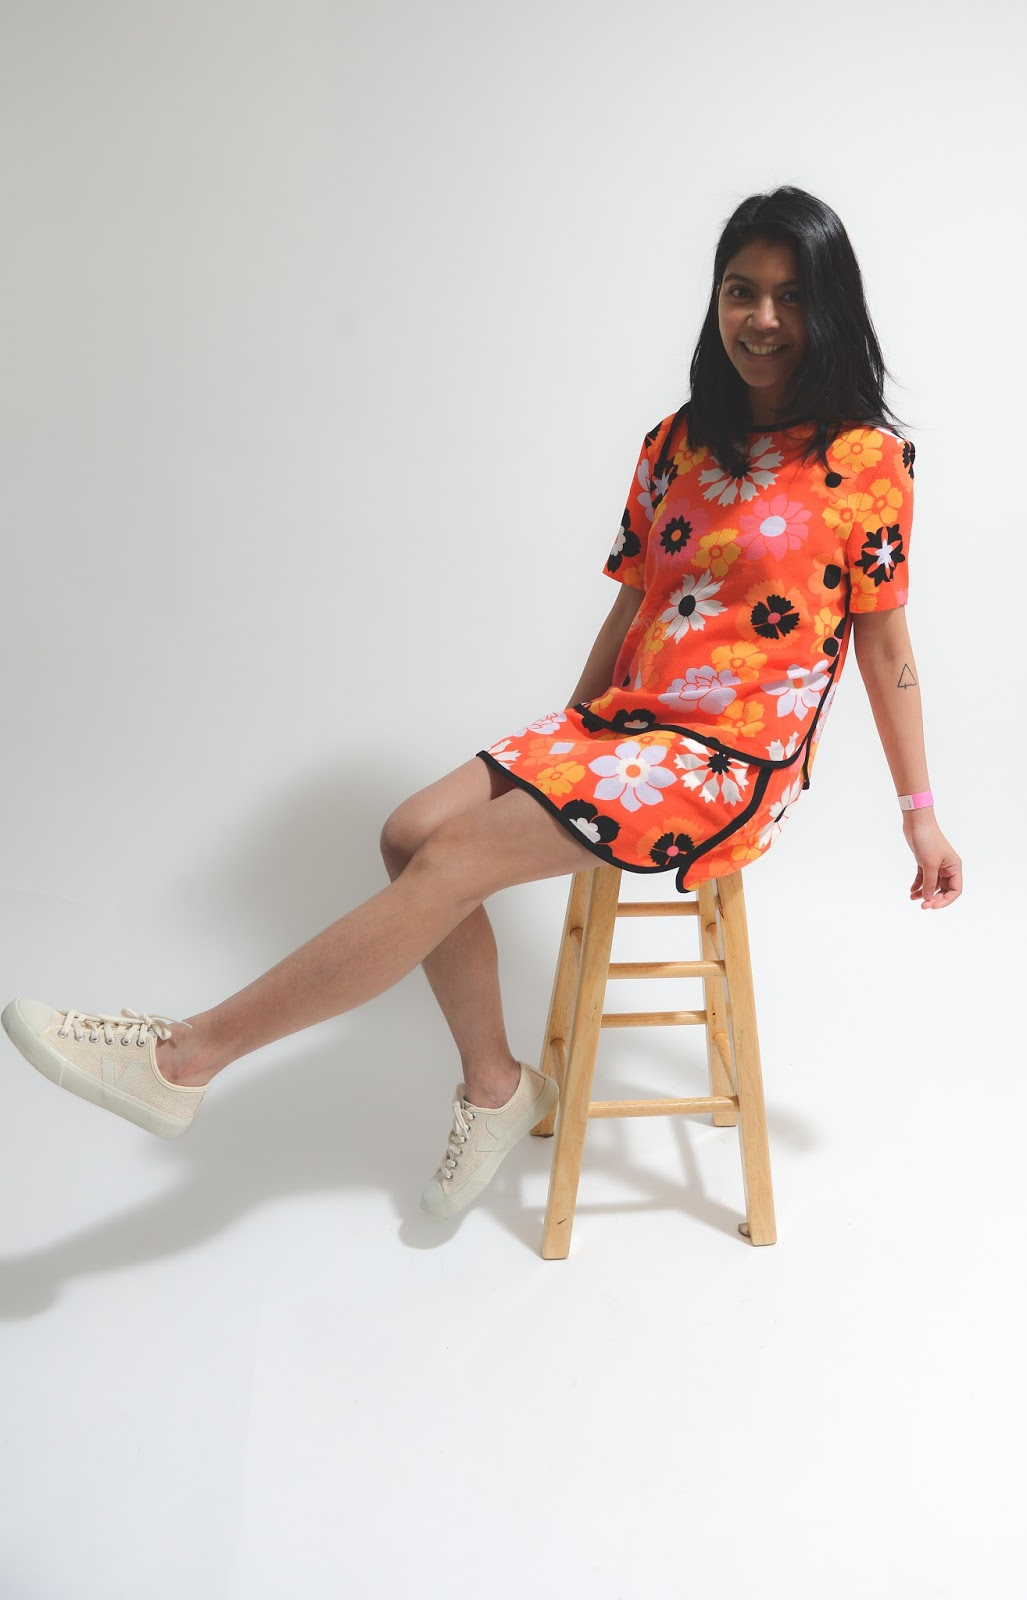 victoria beckham, target collaboration, portland blogger, flower print, vbxtarget, style blogger, neutral sneaker, target style, pdx style blogger, summer style, skirt, shirt, tee, blouse